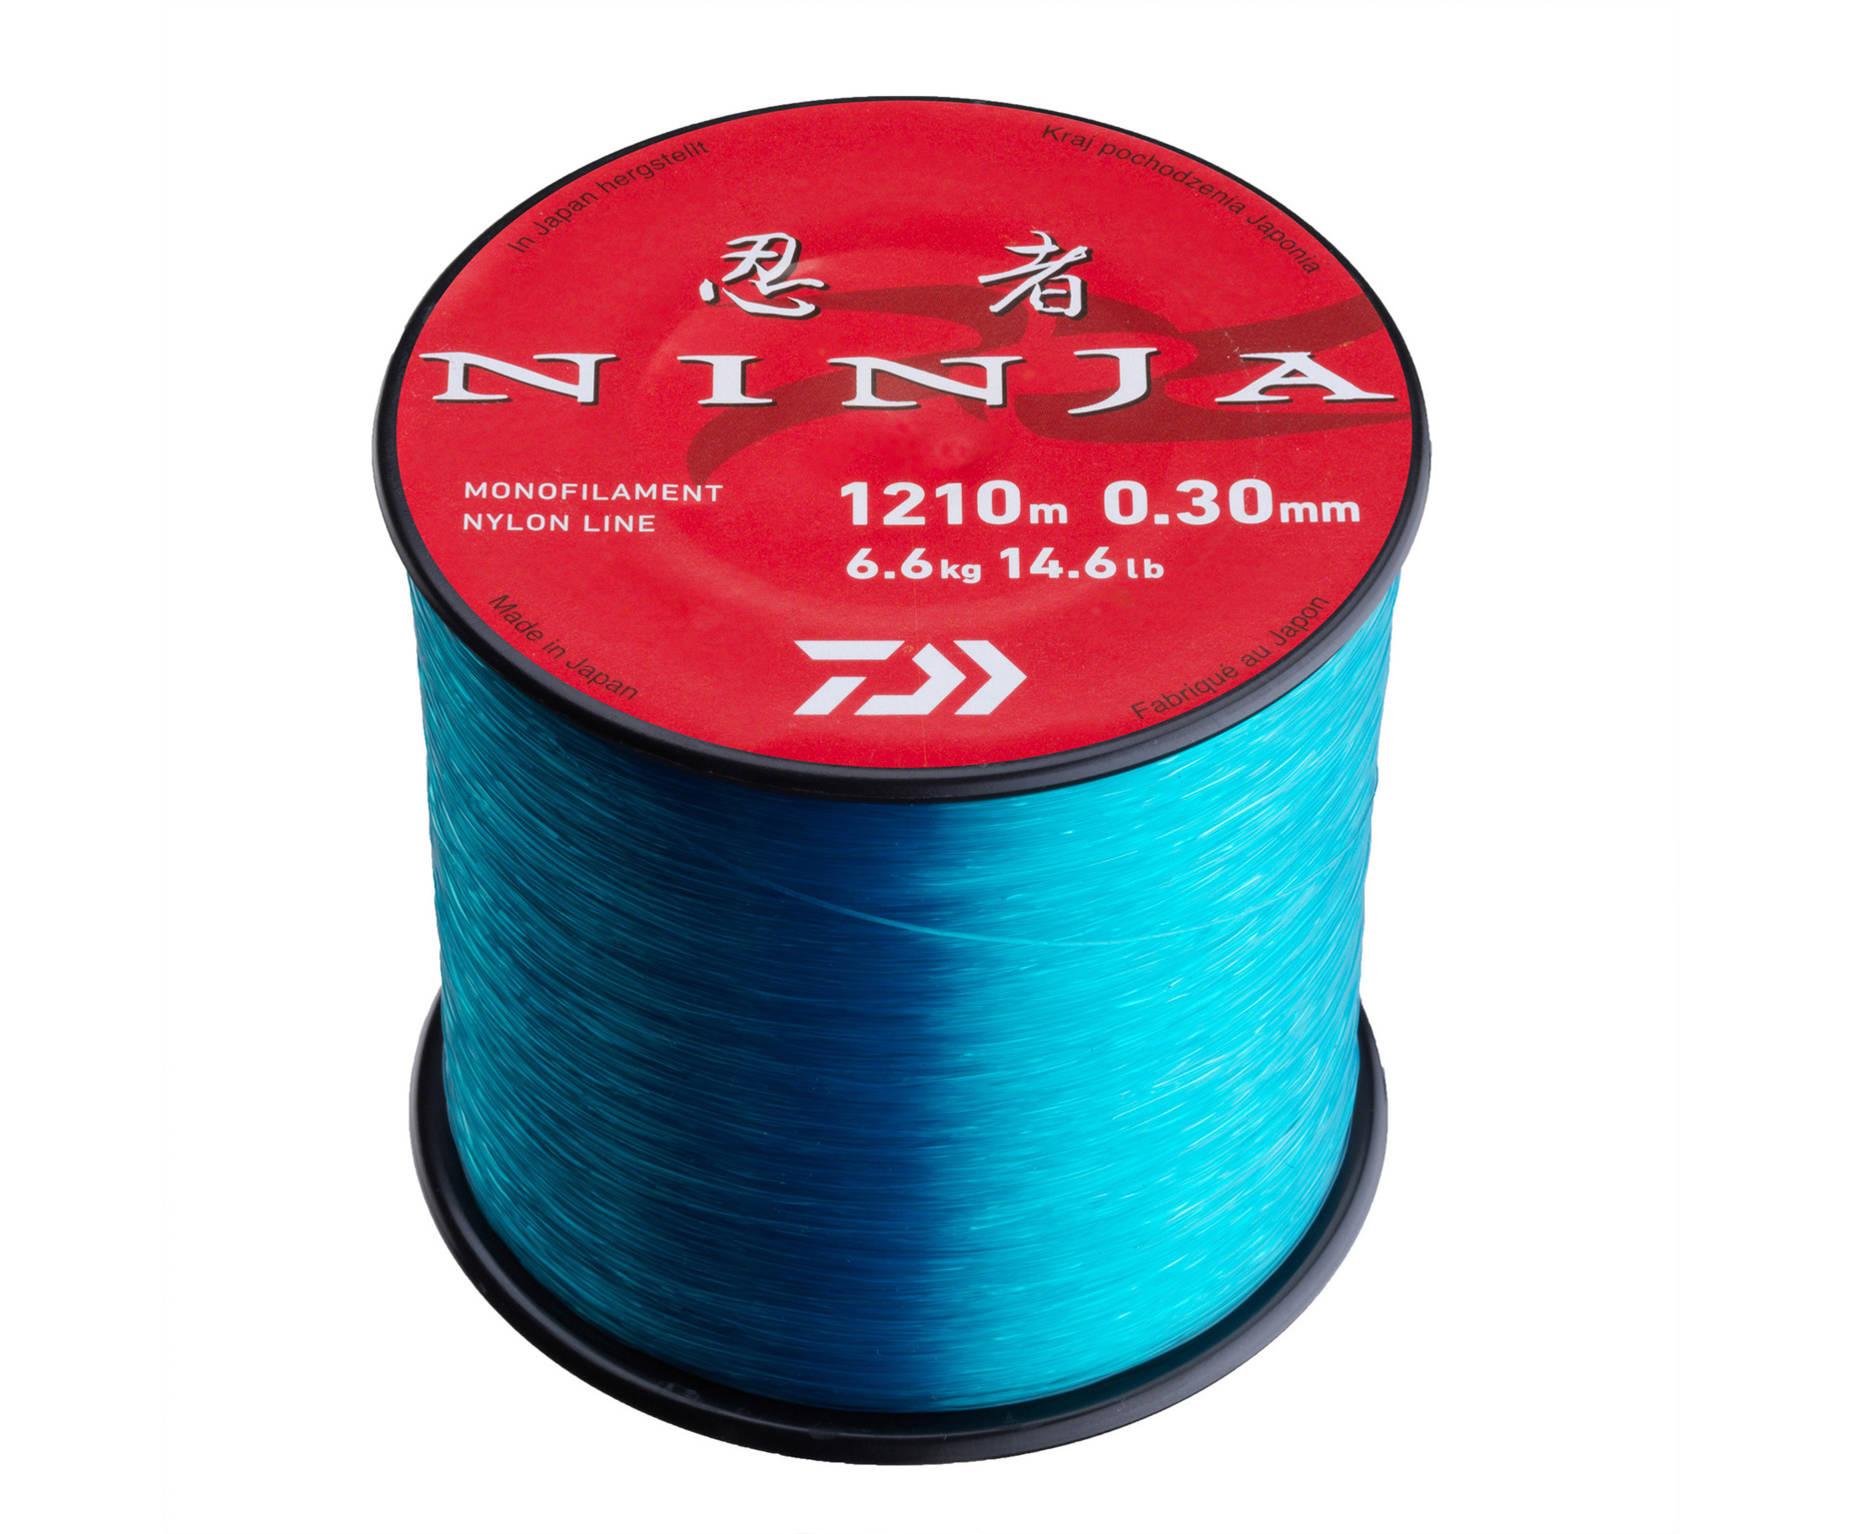 Daiwa ¯y³ka Ninja X Mono - 2400m 0.20mm 3.1kg